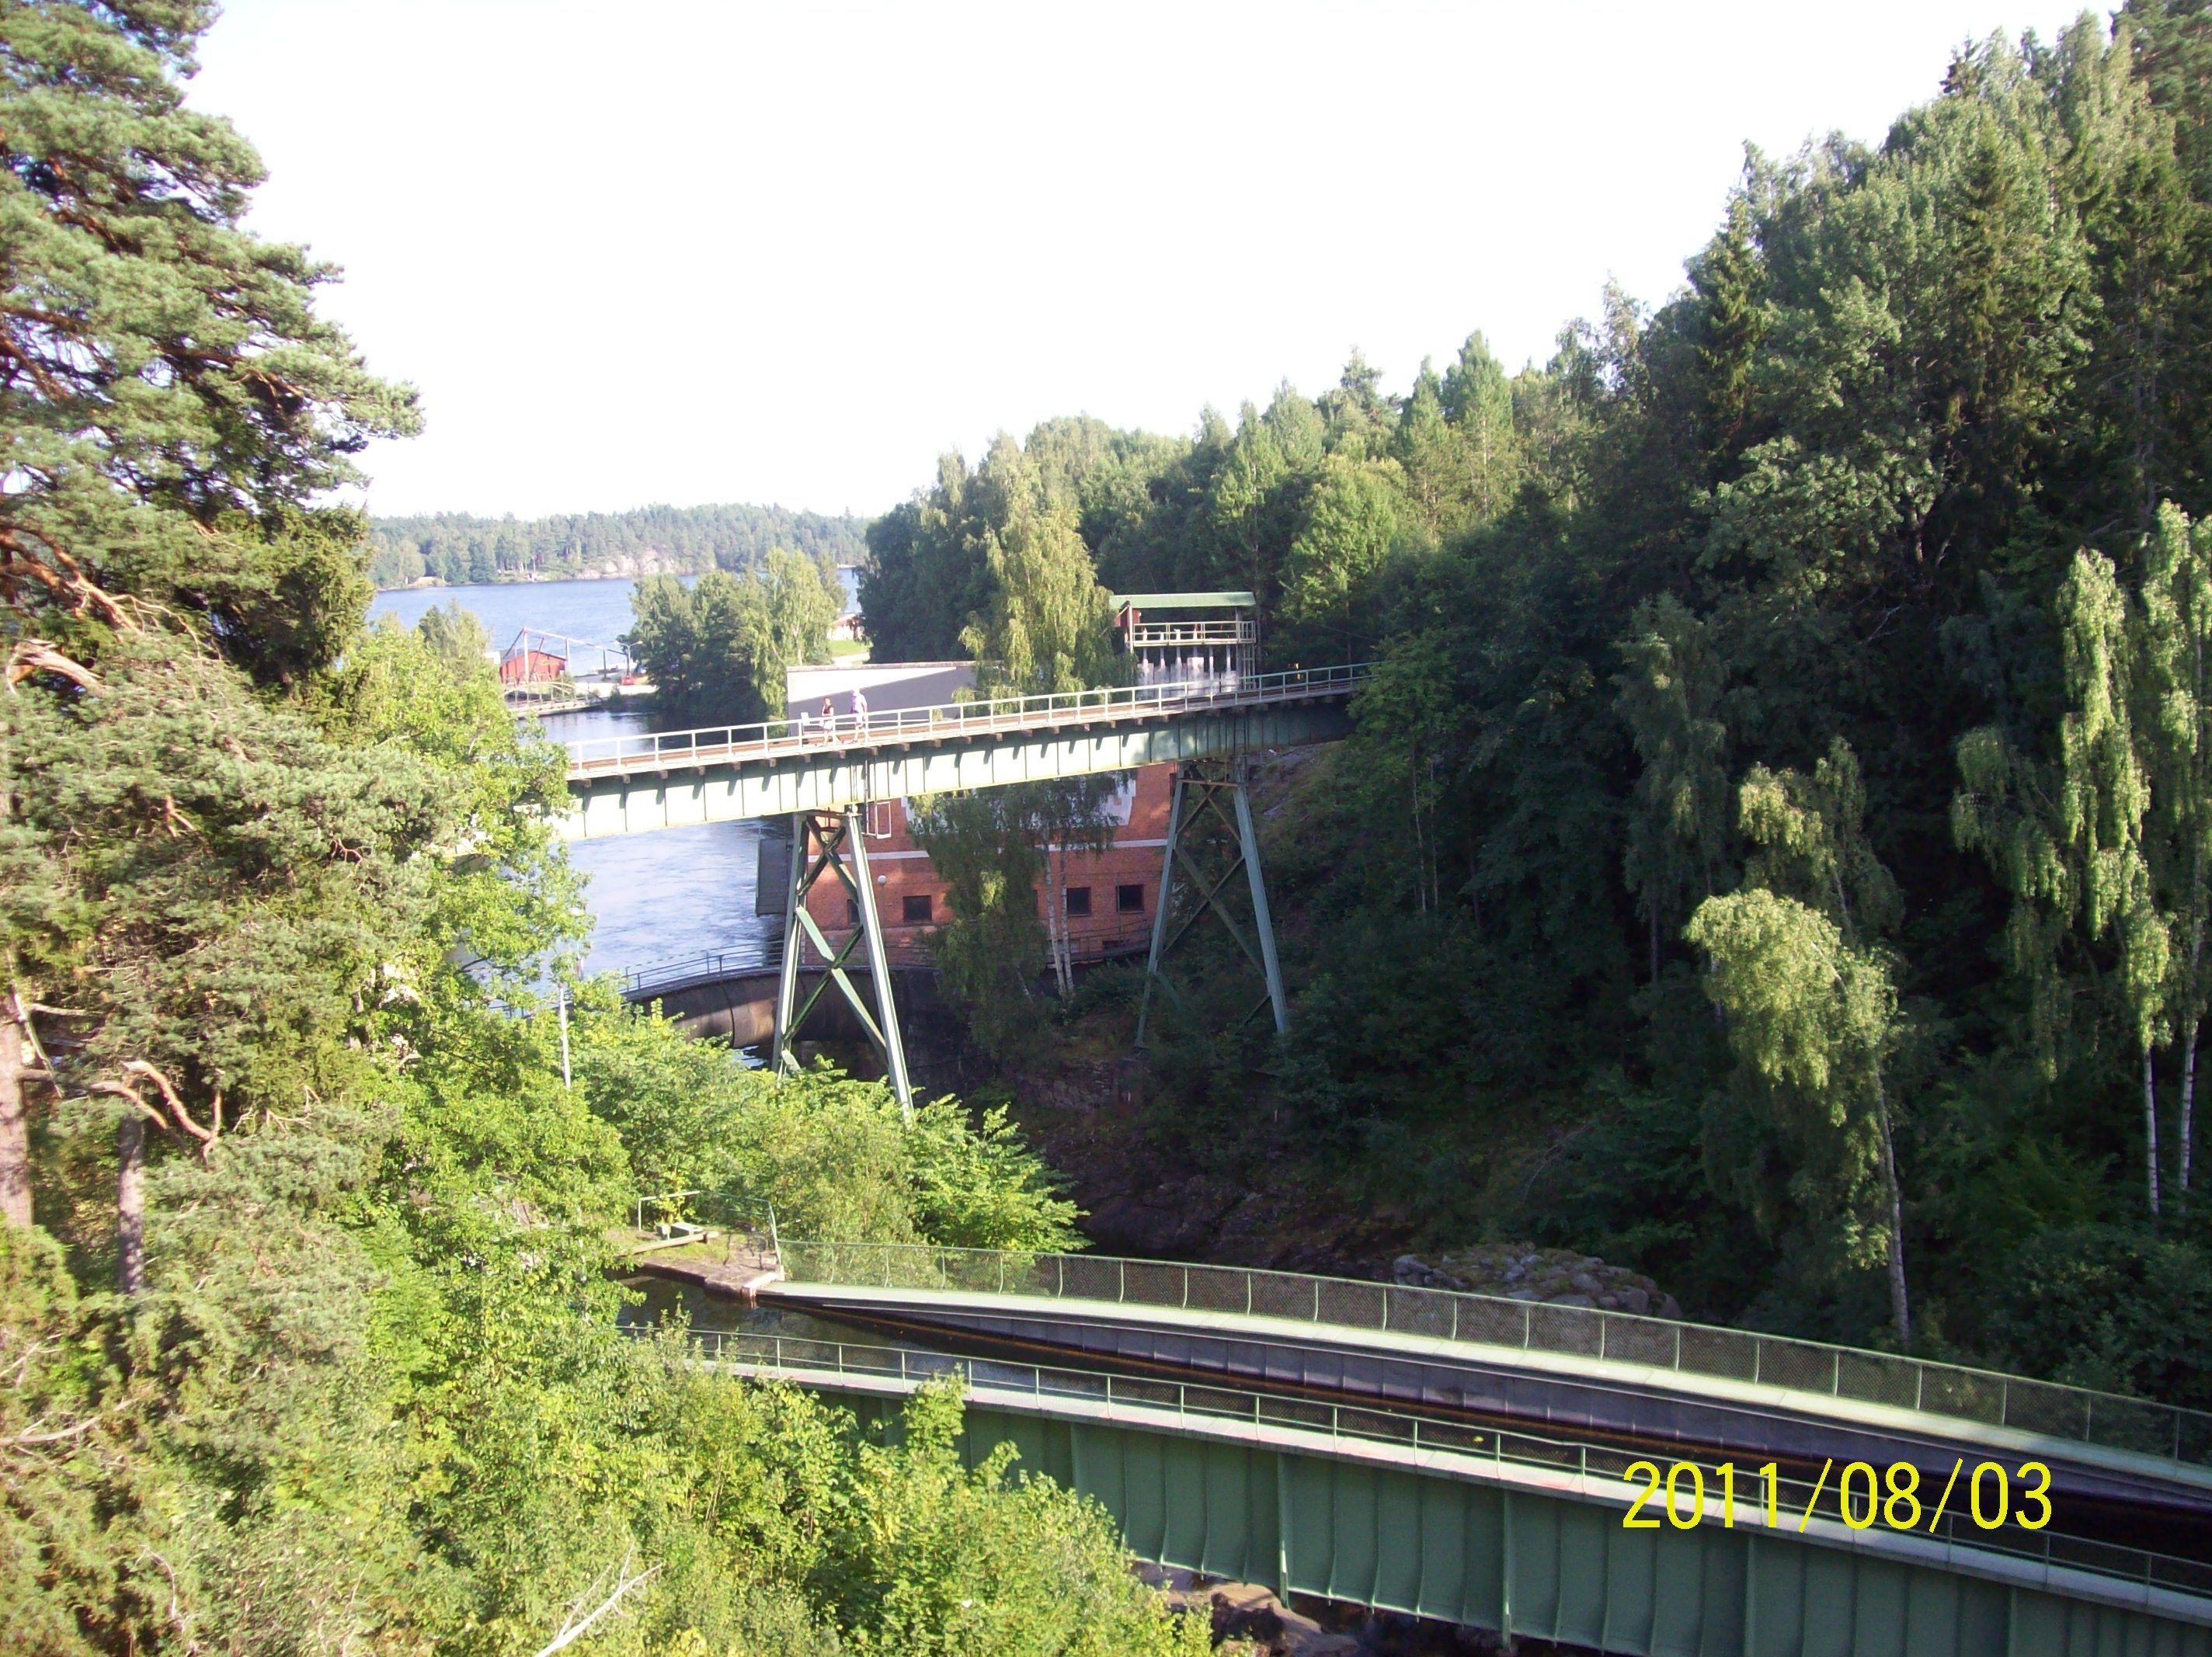 Håveruds akvedukter. Dalsland